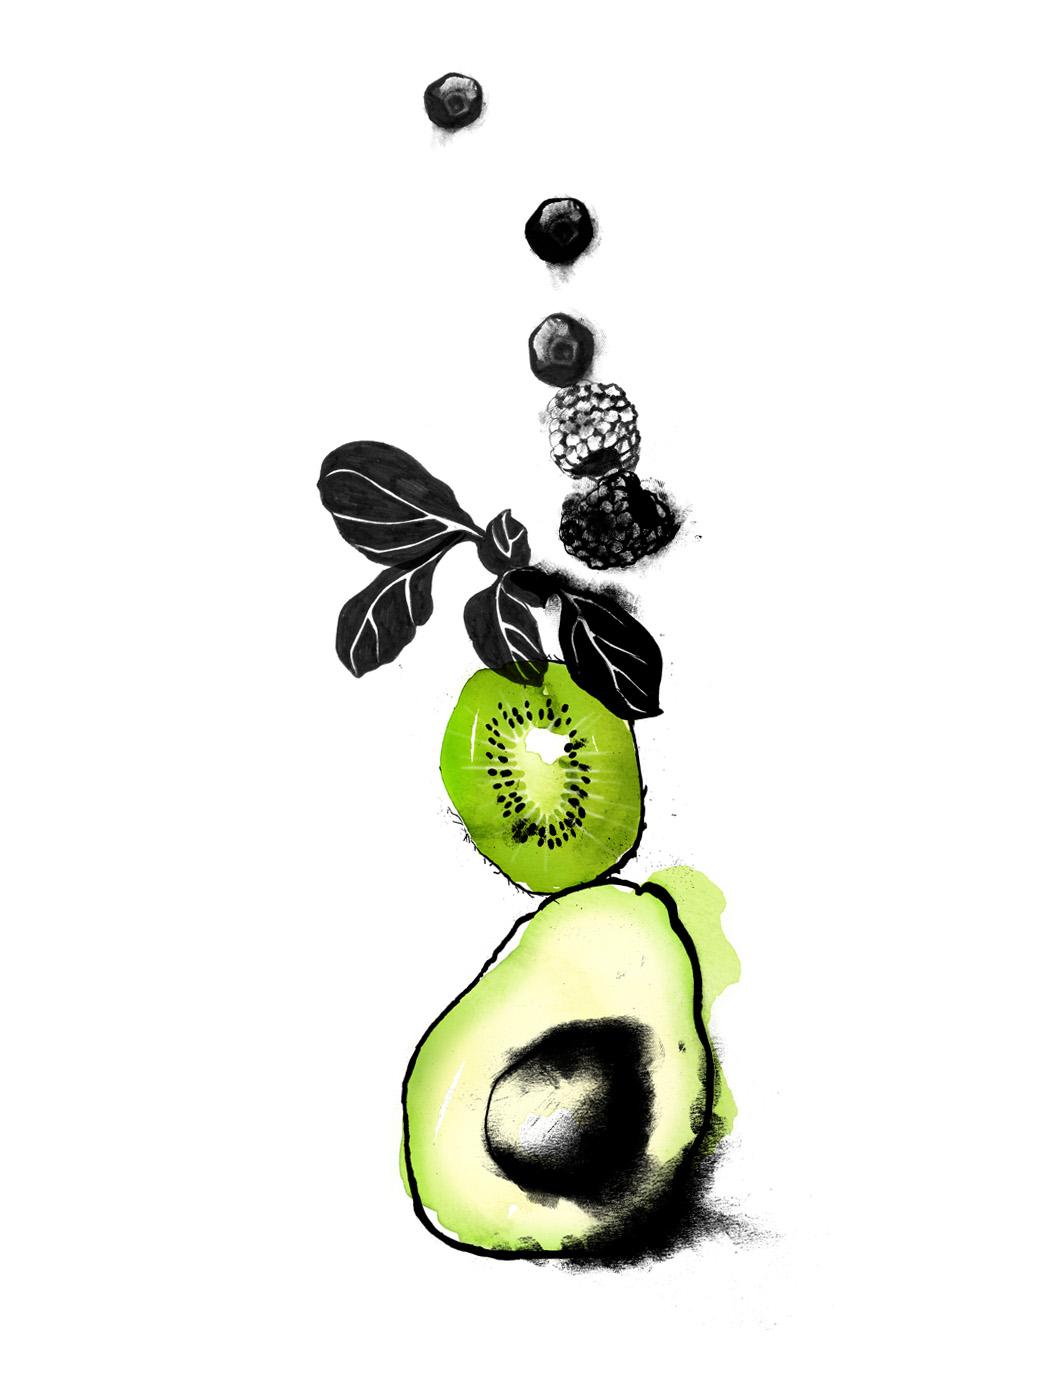 Christina Drejenstam avocado kiwi